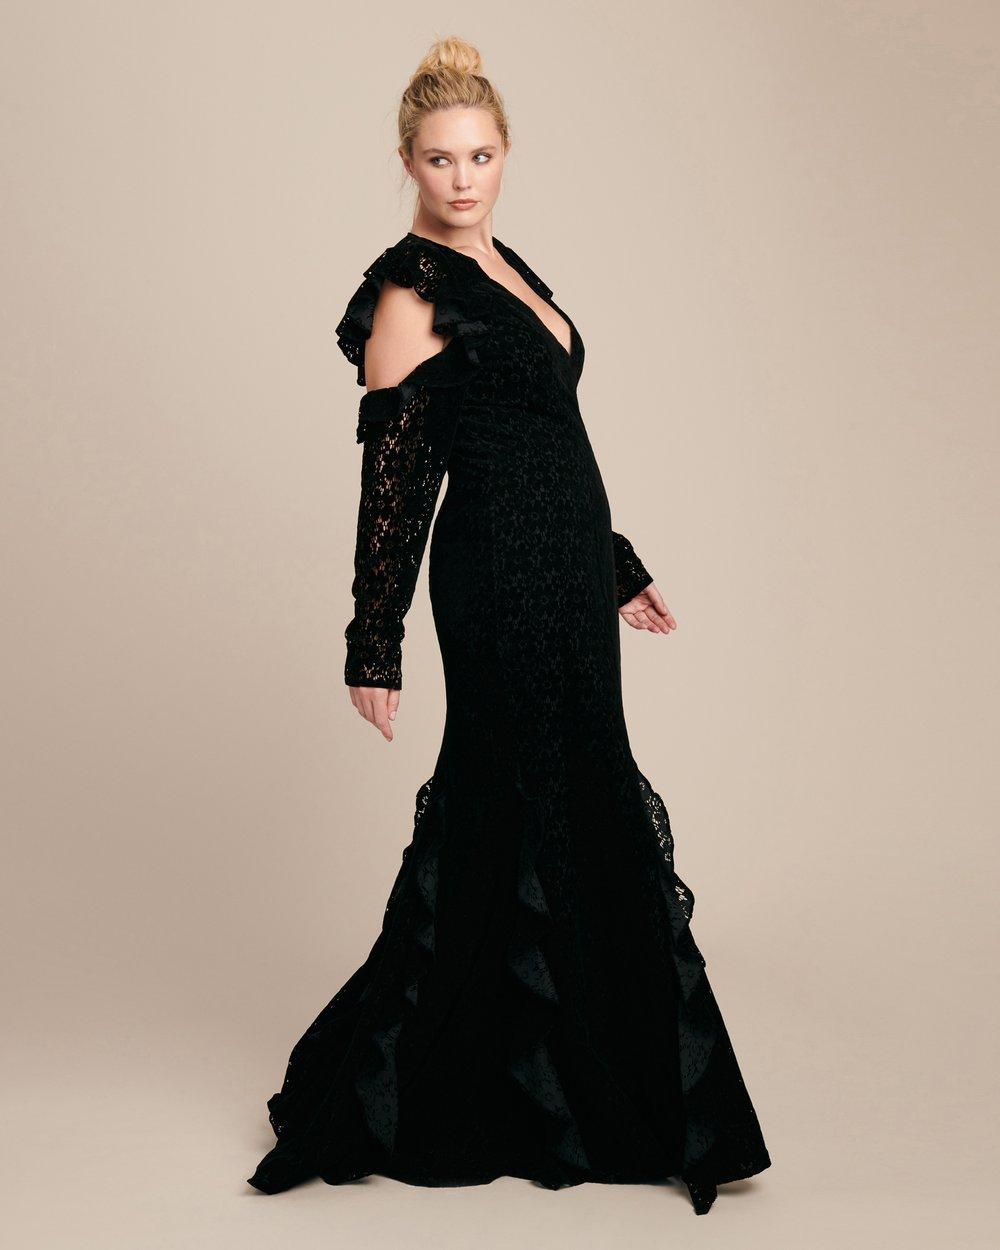 Luxury Plus SIze Fashion Finds at 11 Honore: ZAC ZAC POSEN Carola Plus Size Gown